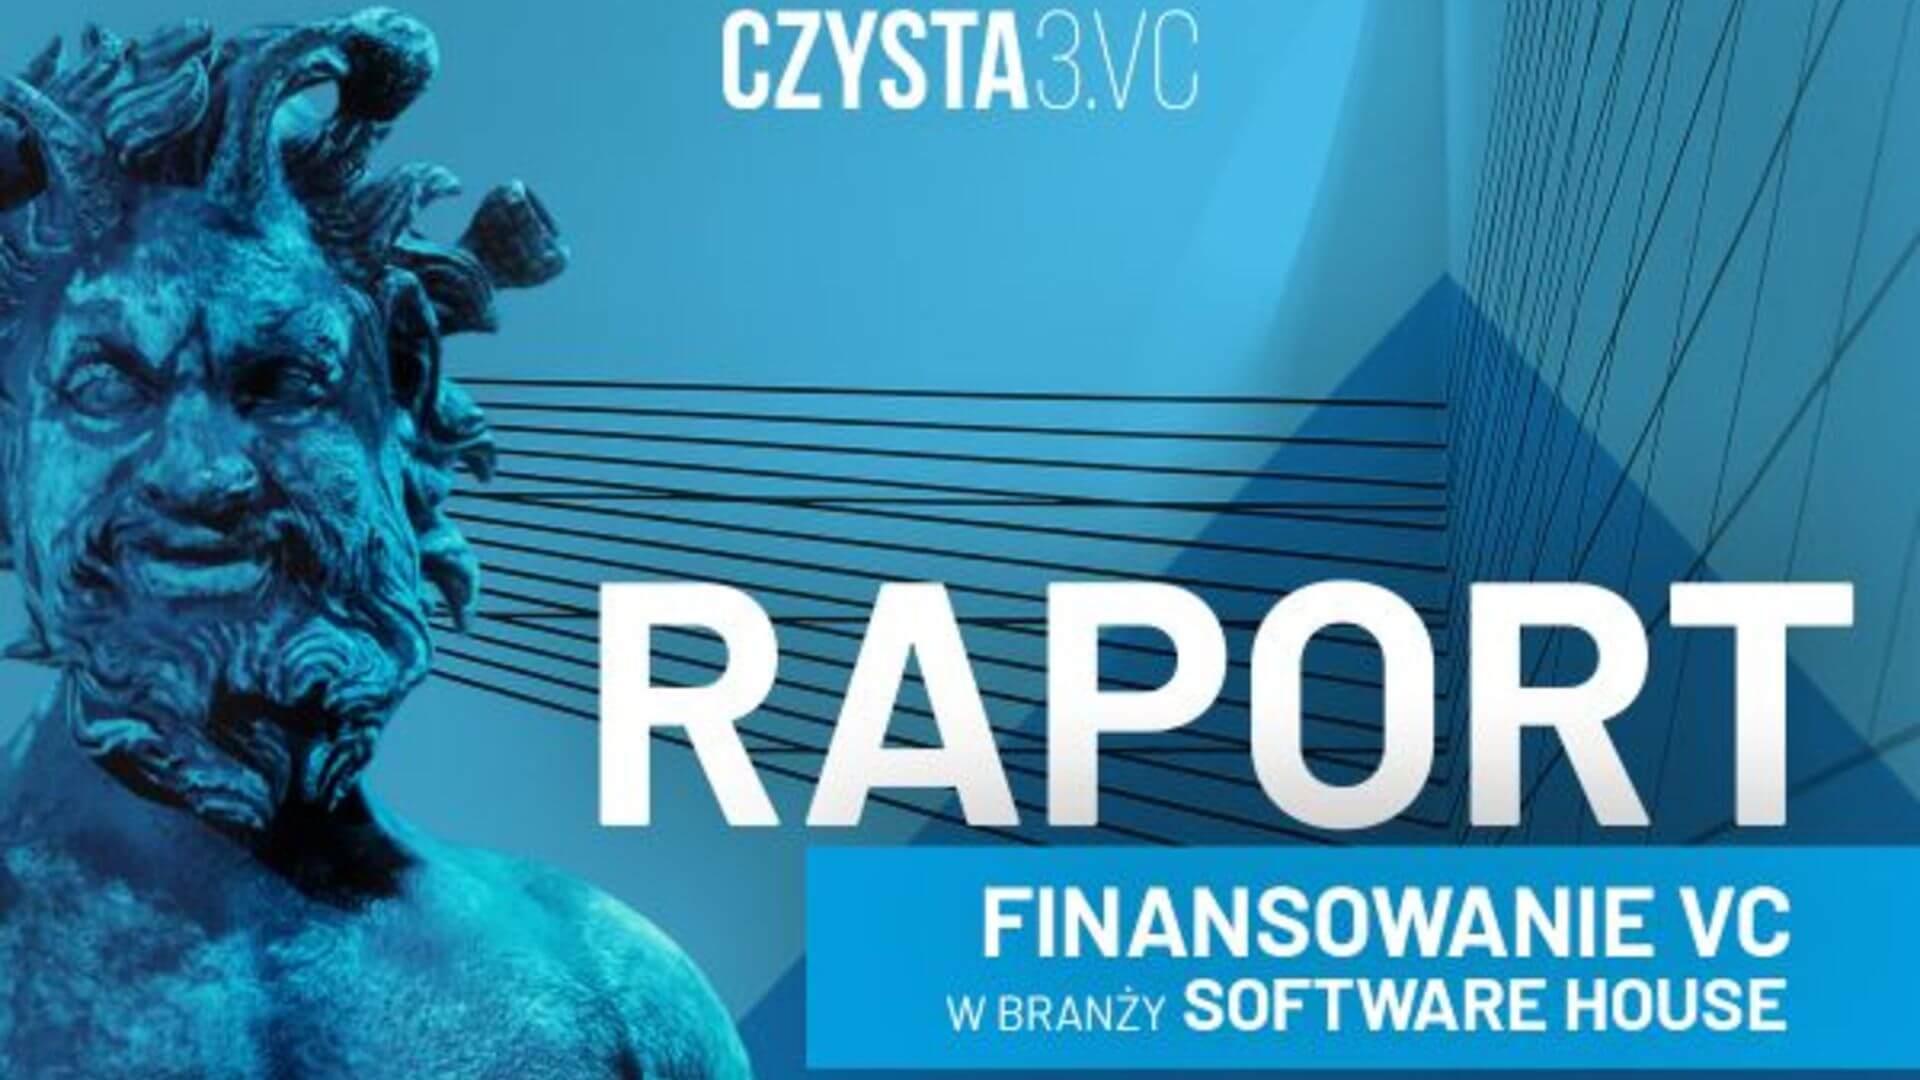 Raport: Finansowanie venture capital w branży software house